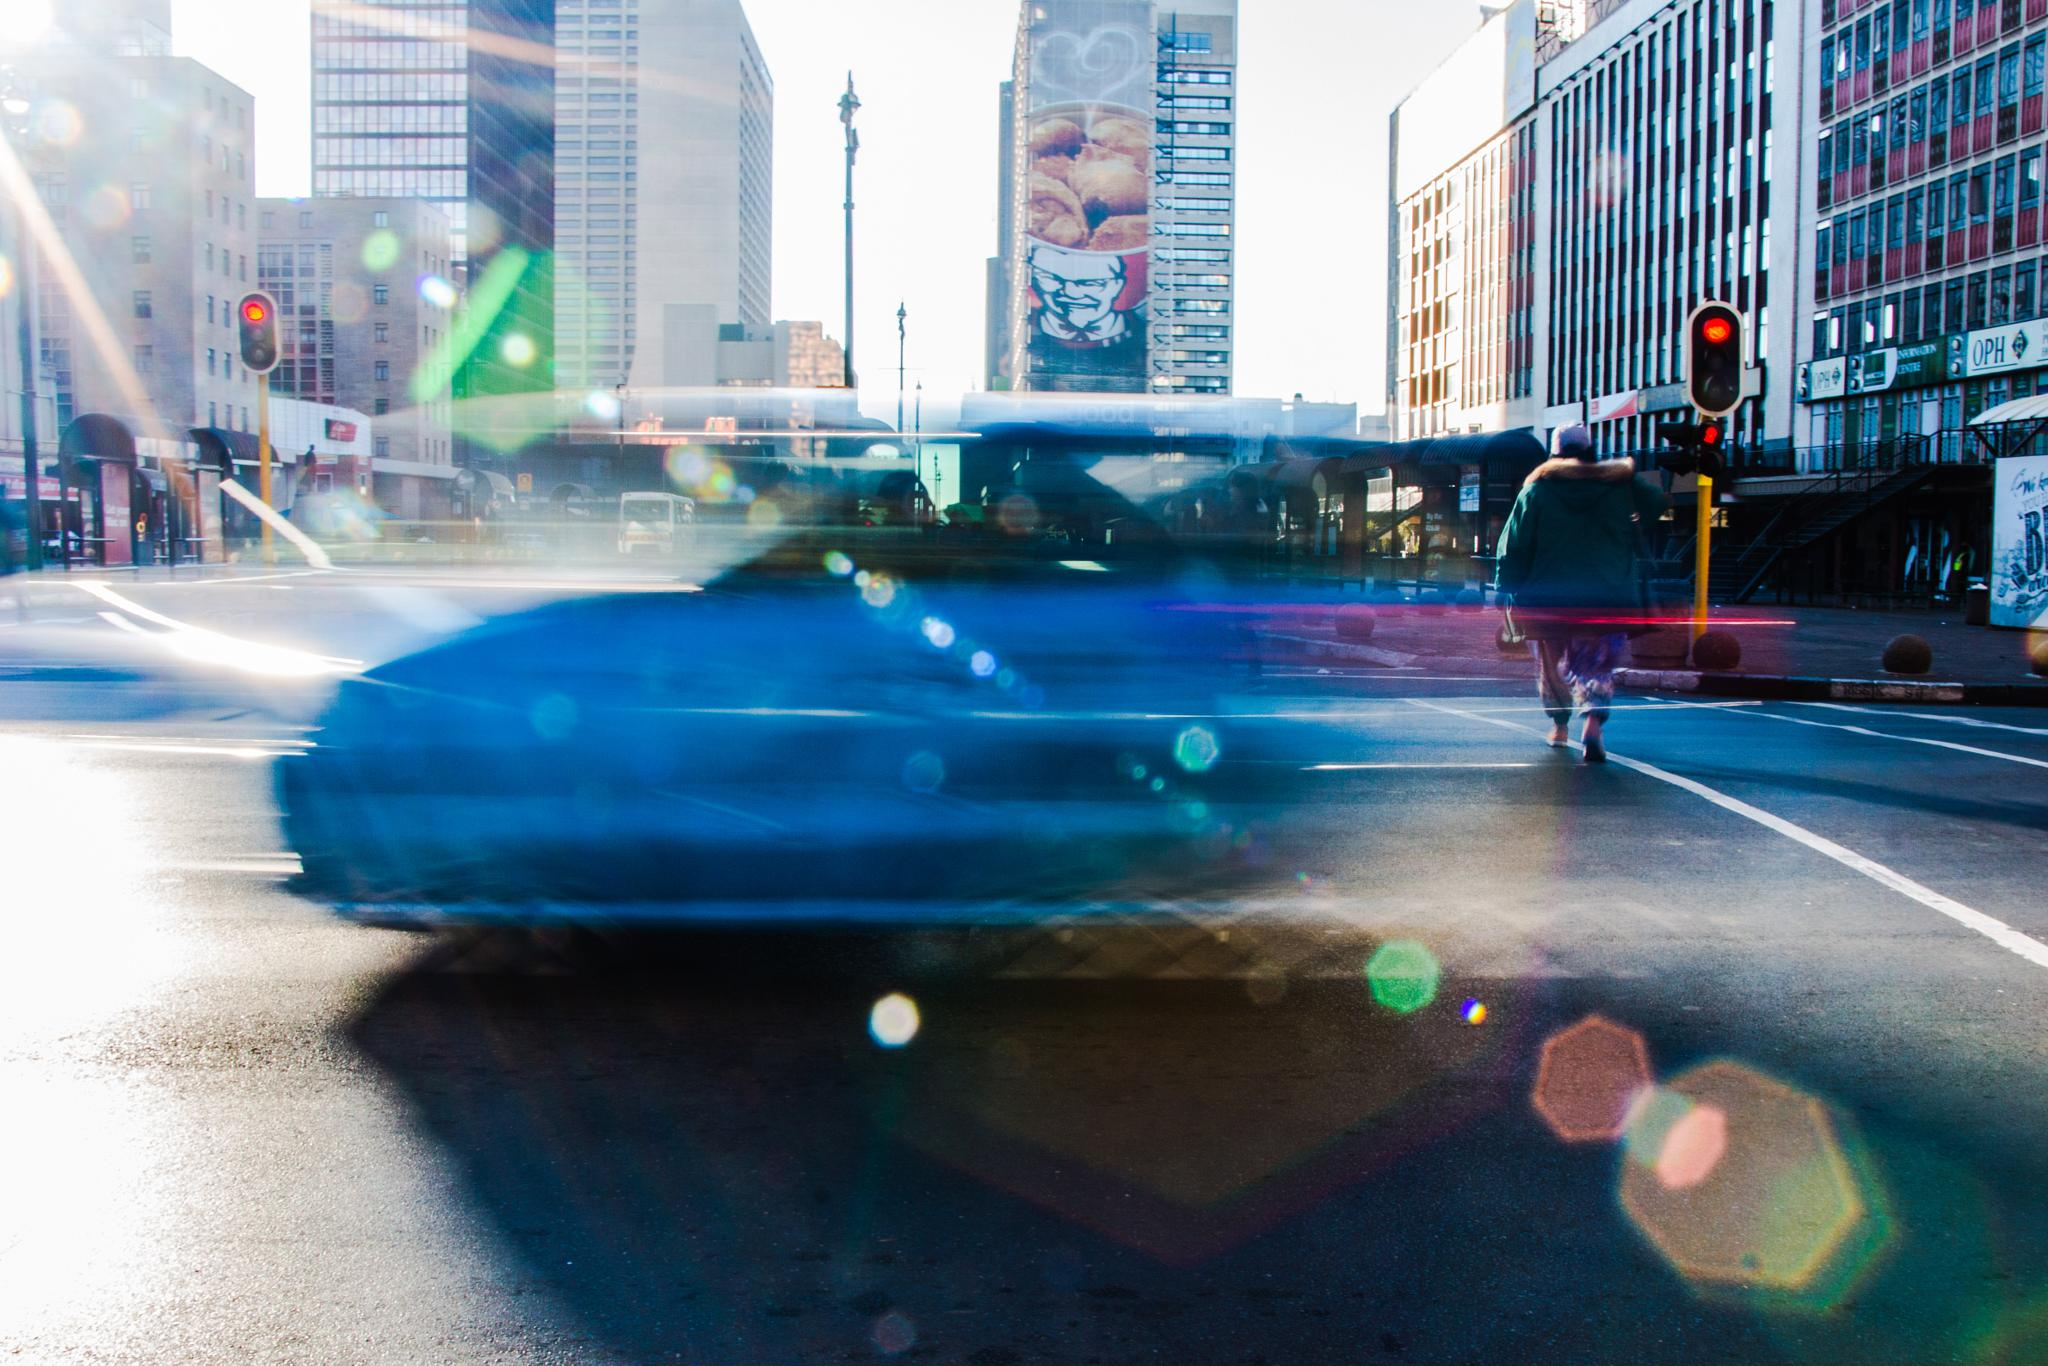 Chasing Cars by Lauren Whitelaw